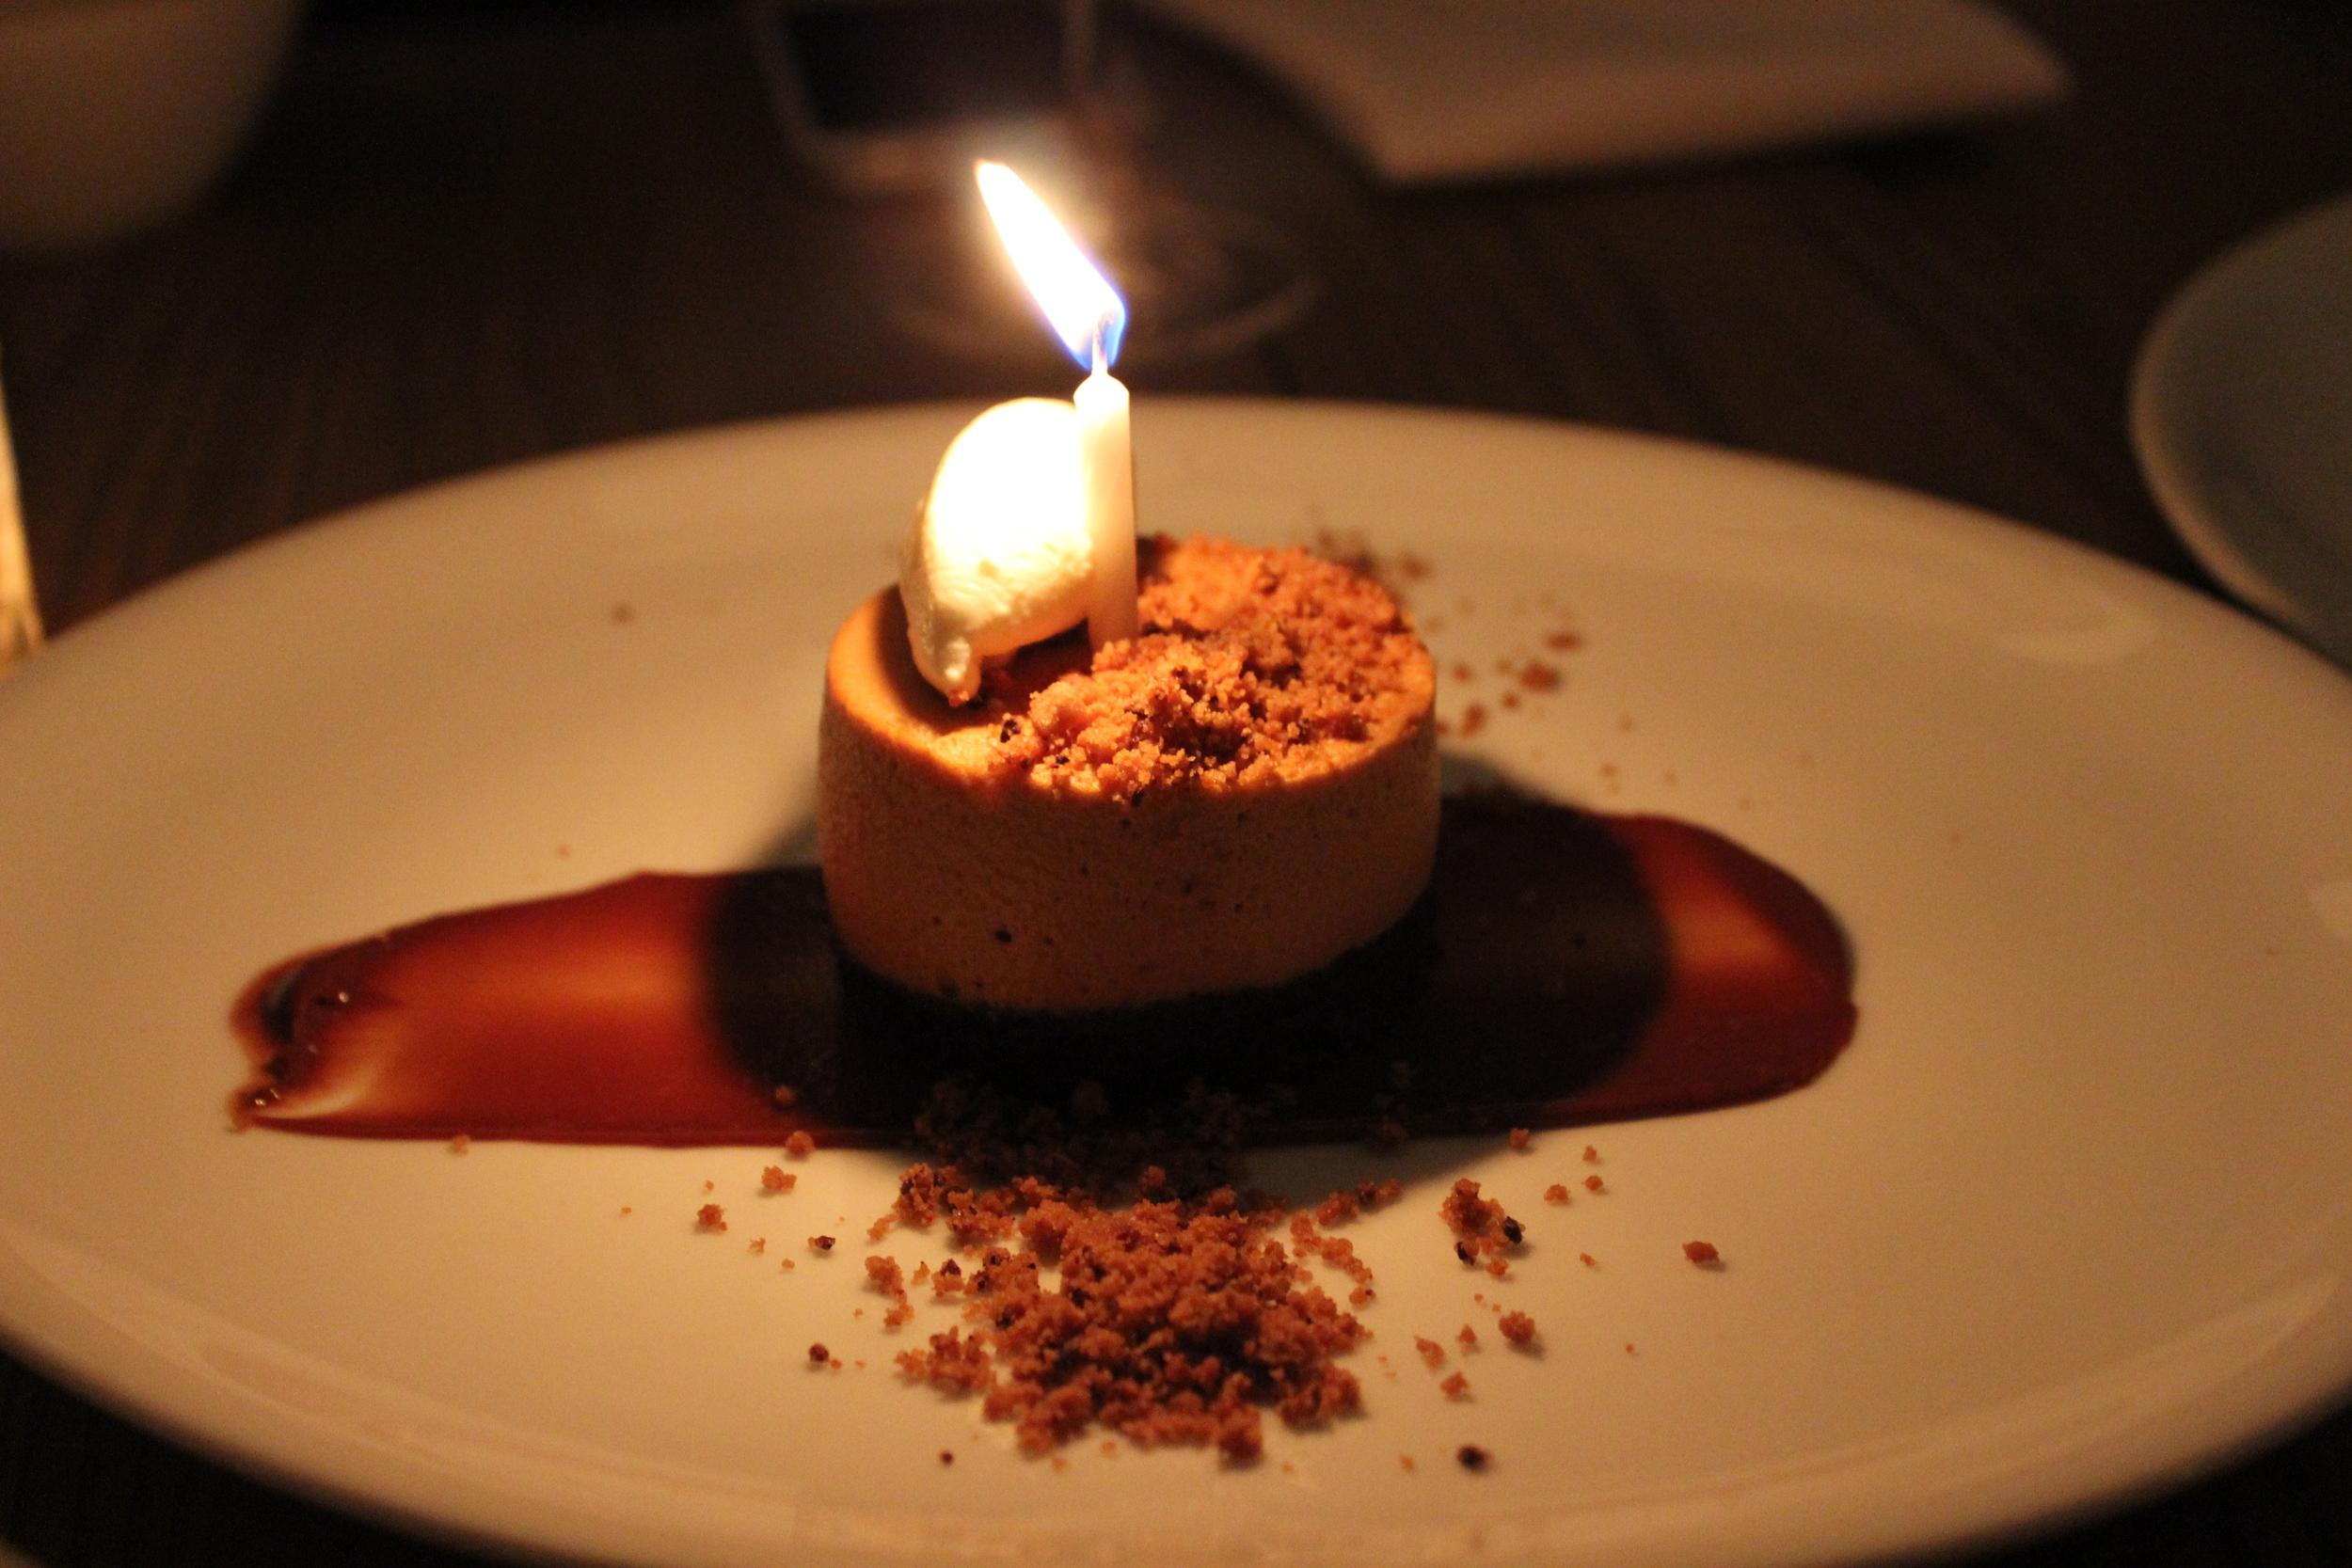 Birthday Cake of Chocolate Goodness!